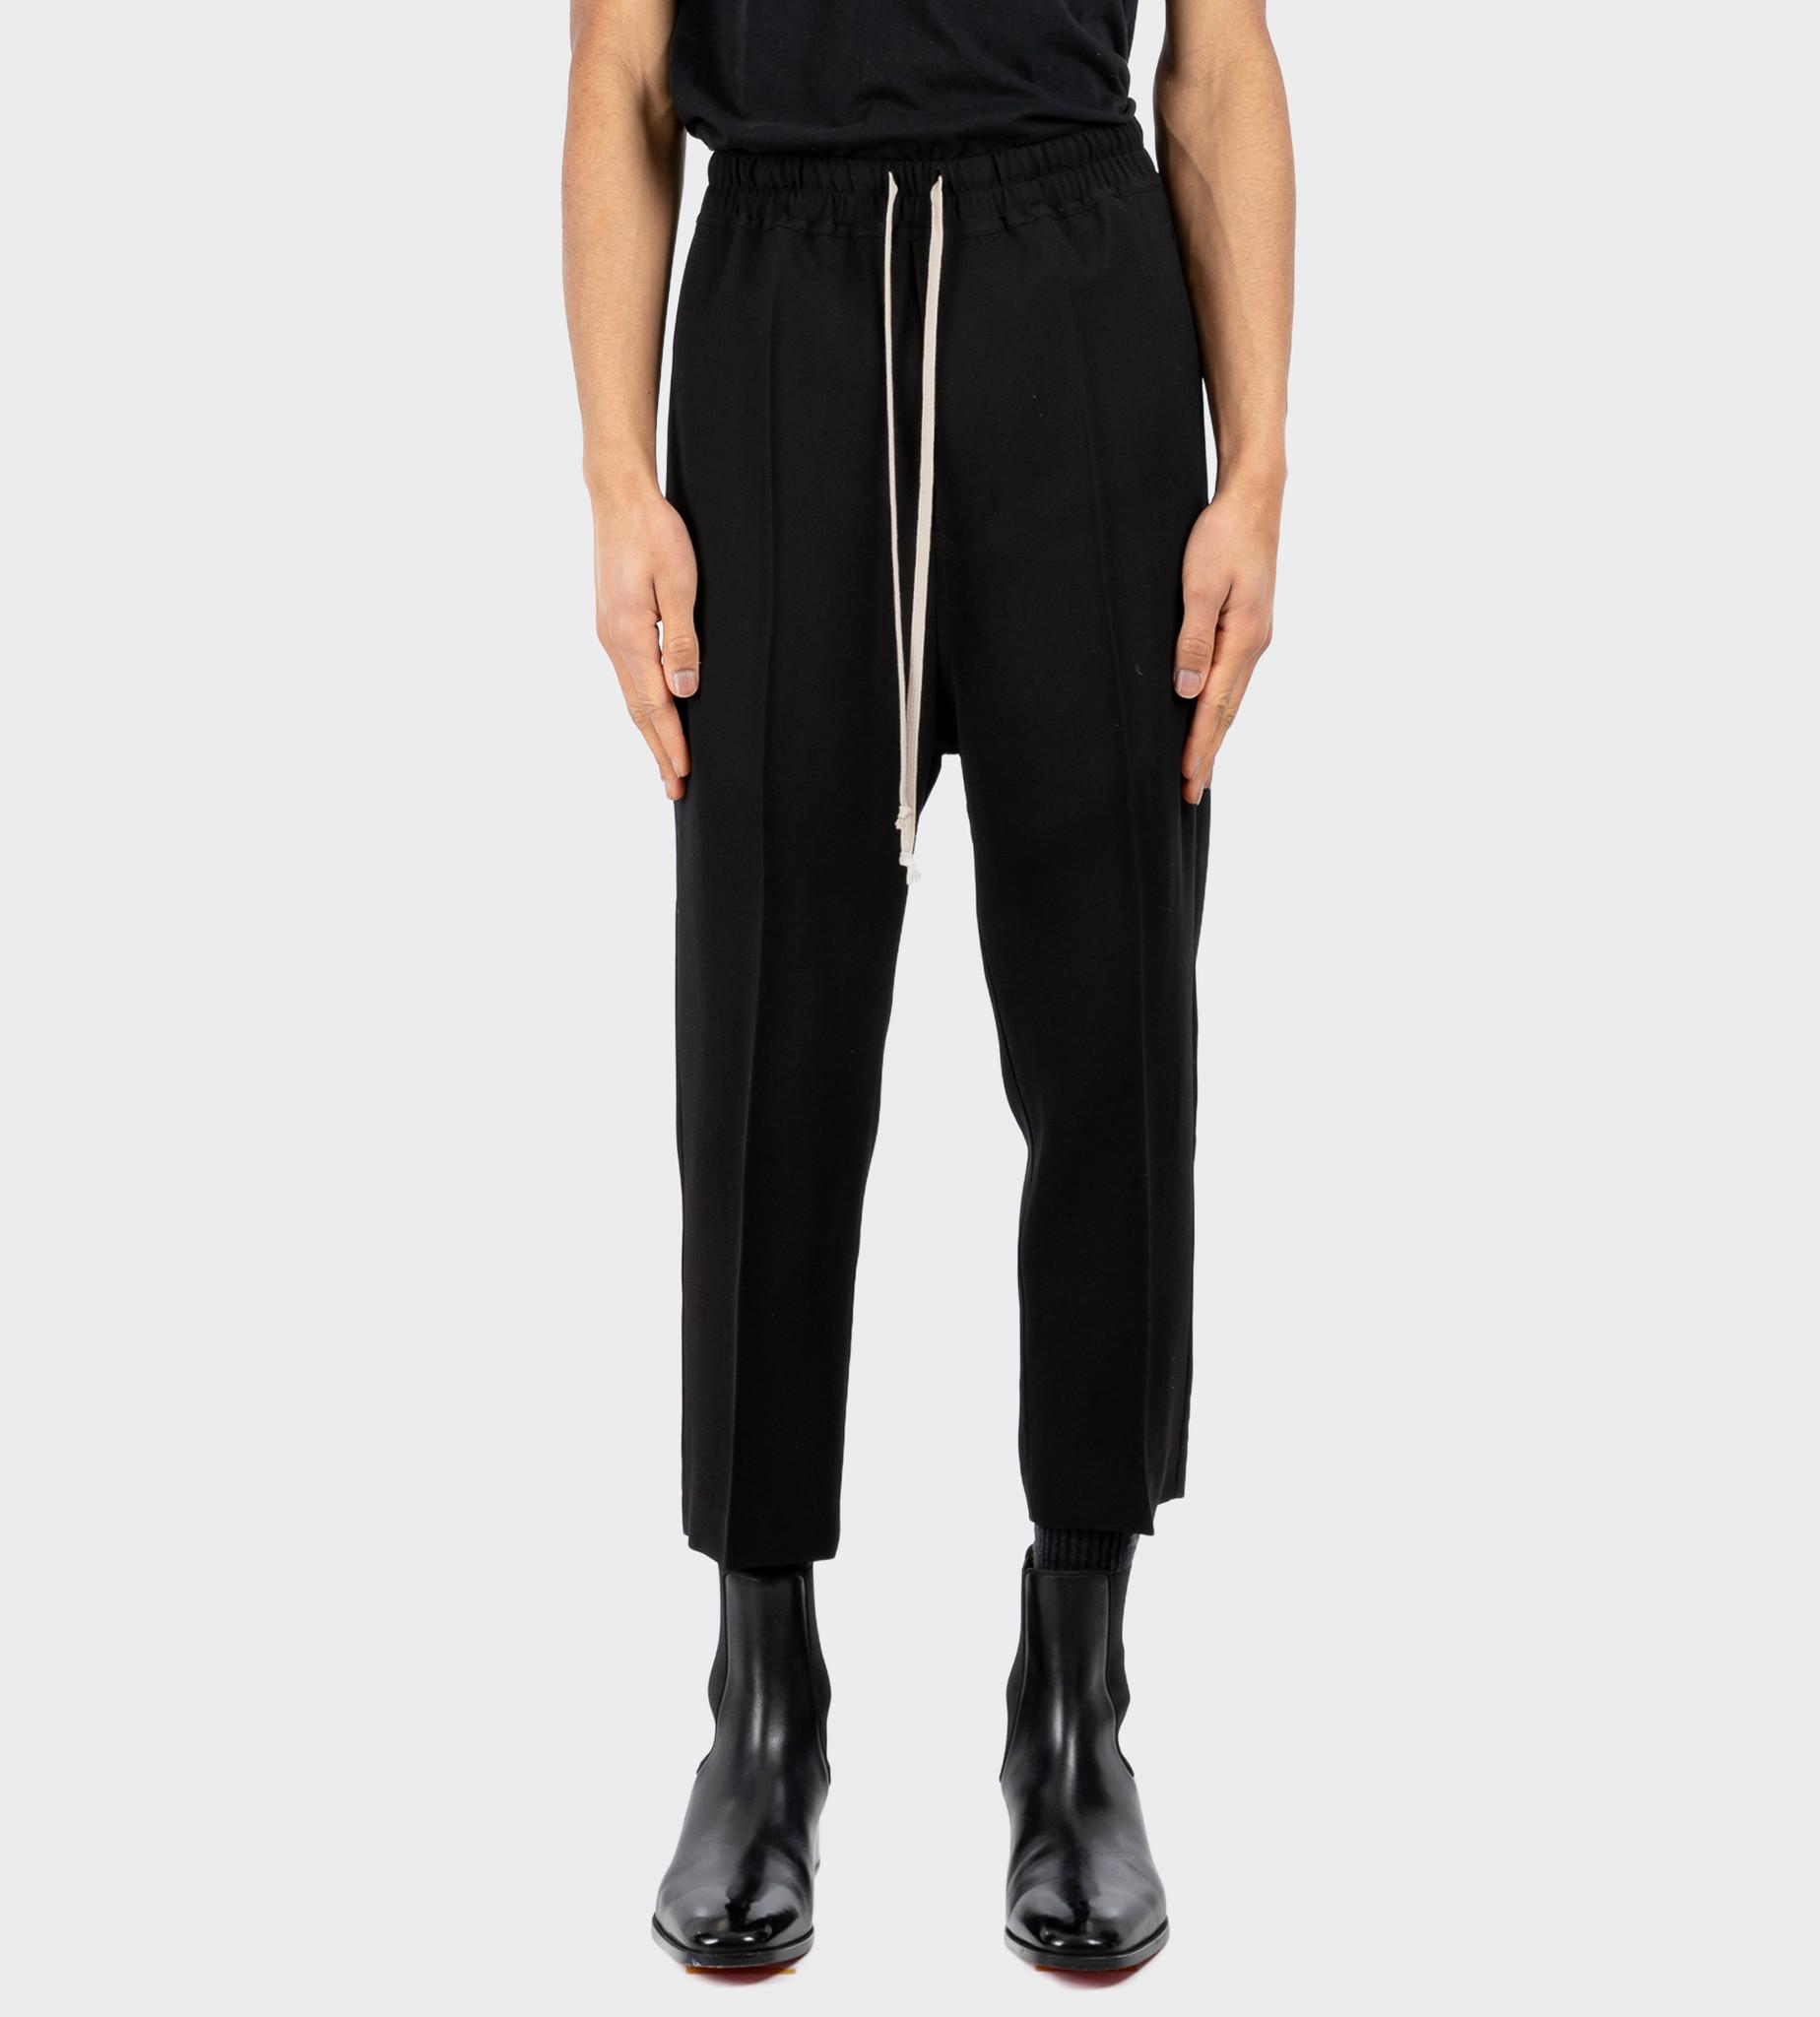 RICK OWENS Phlegethon Pants Black